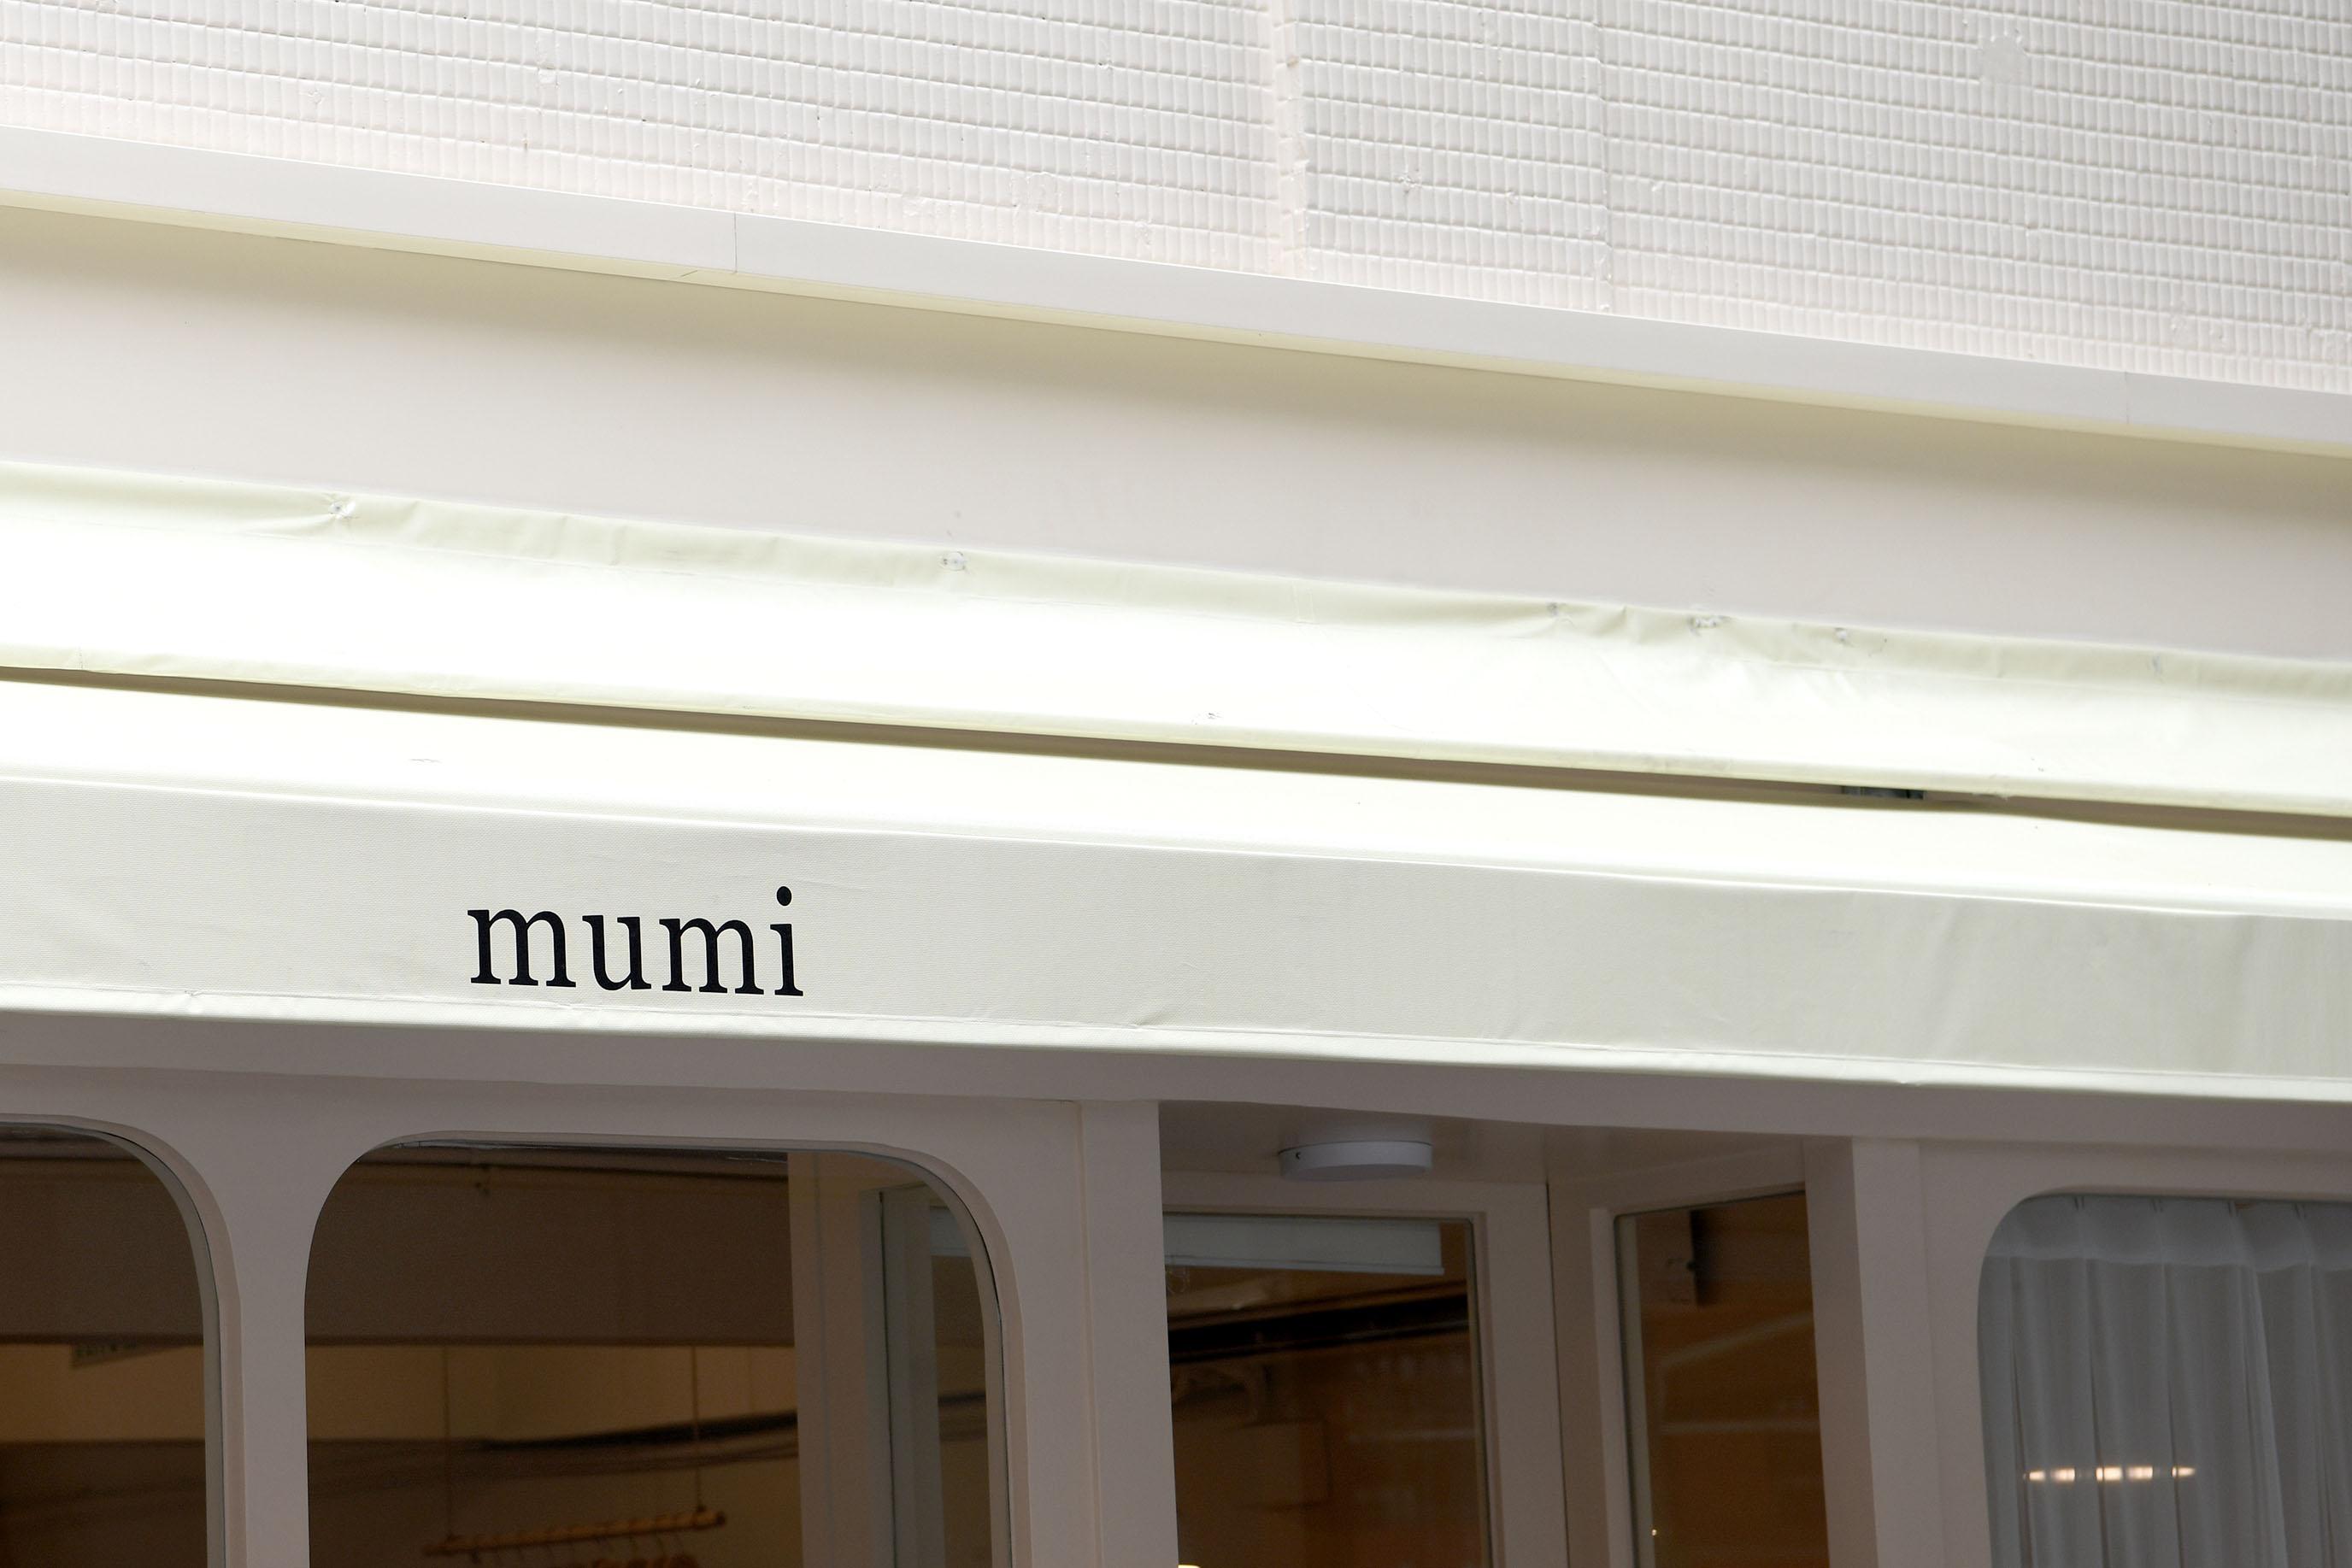 mumi cafe